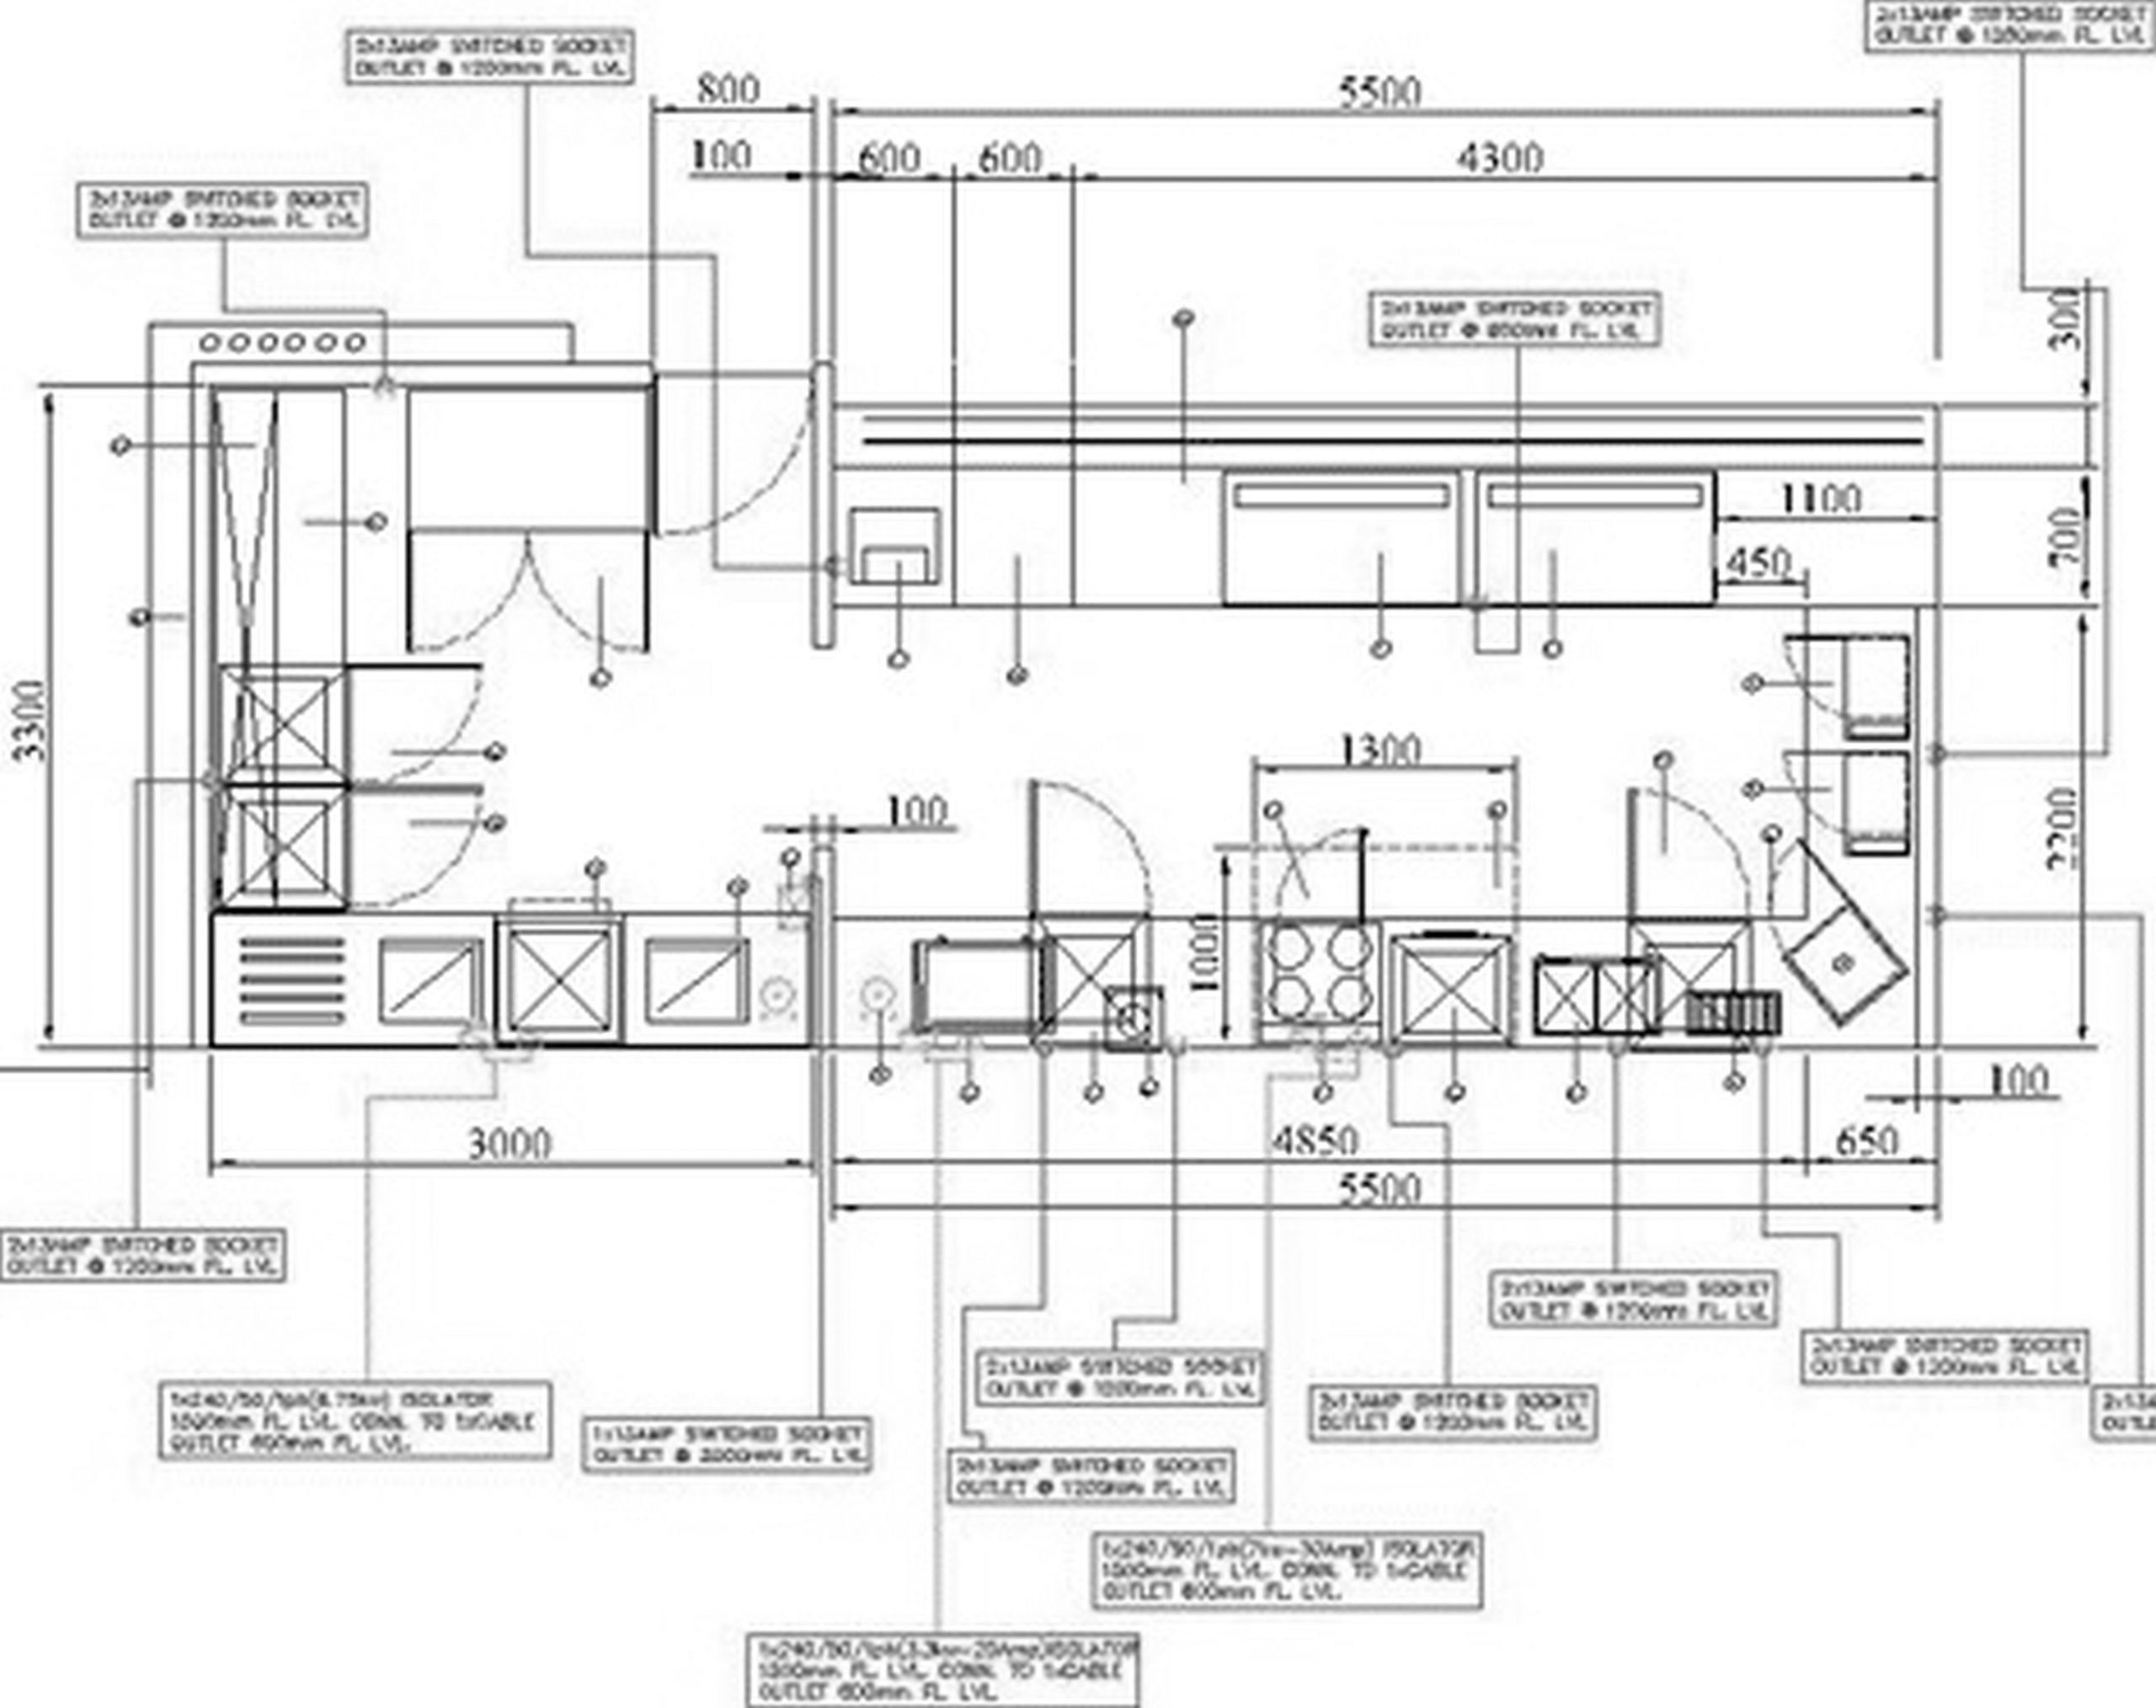 Design Commercial Kitchen Floor Plan   Commercial kitchen design ...